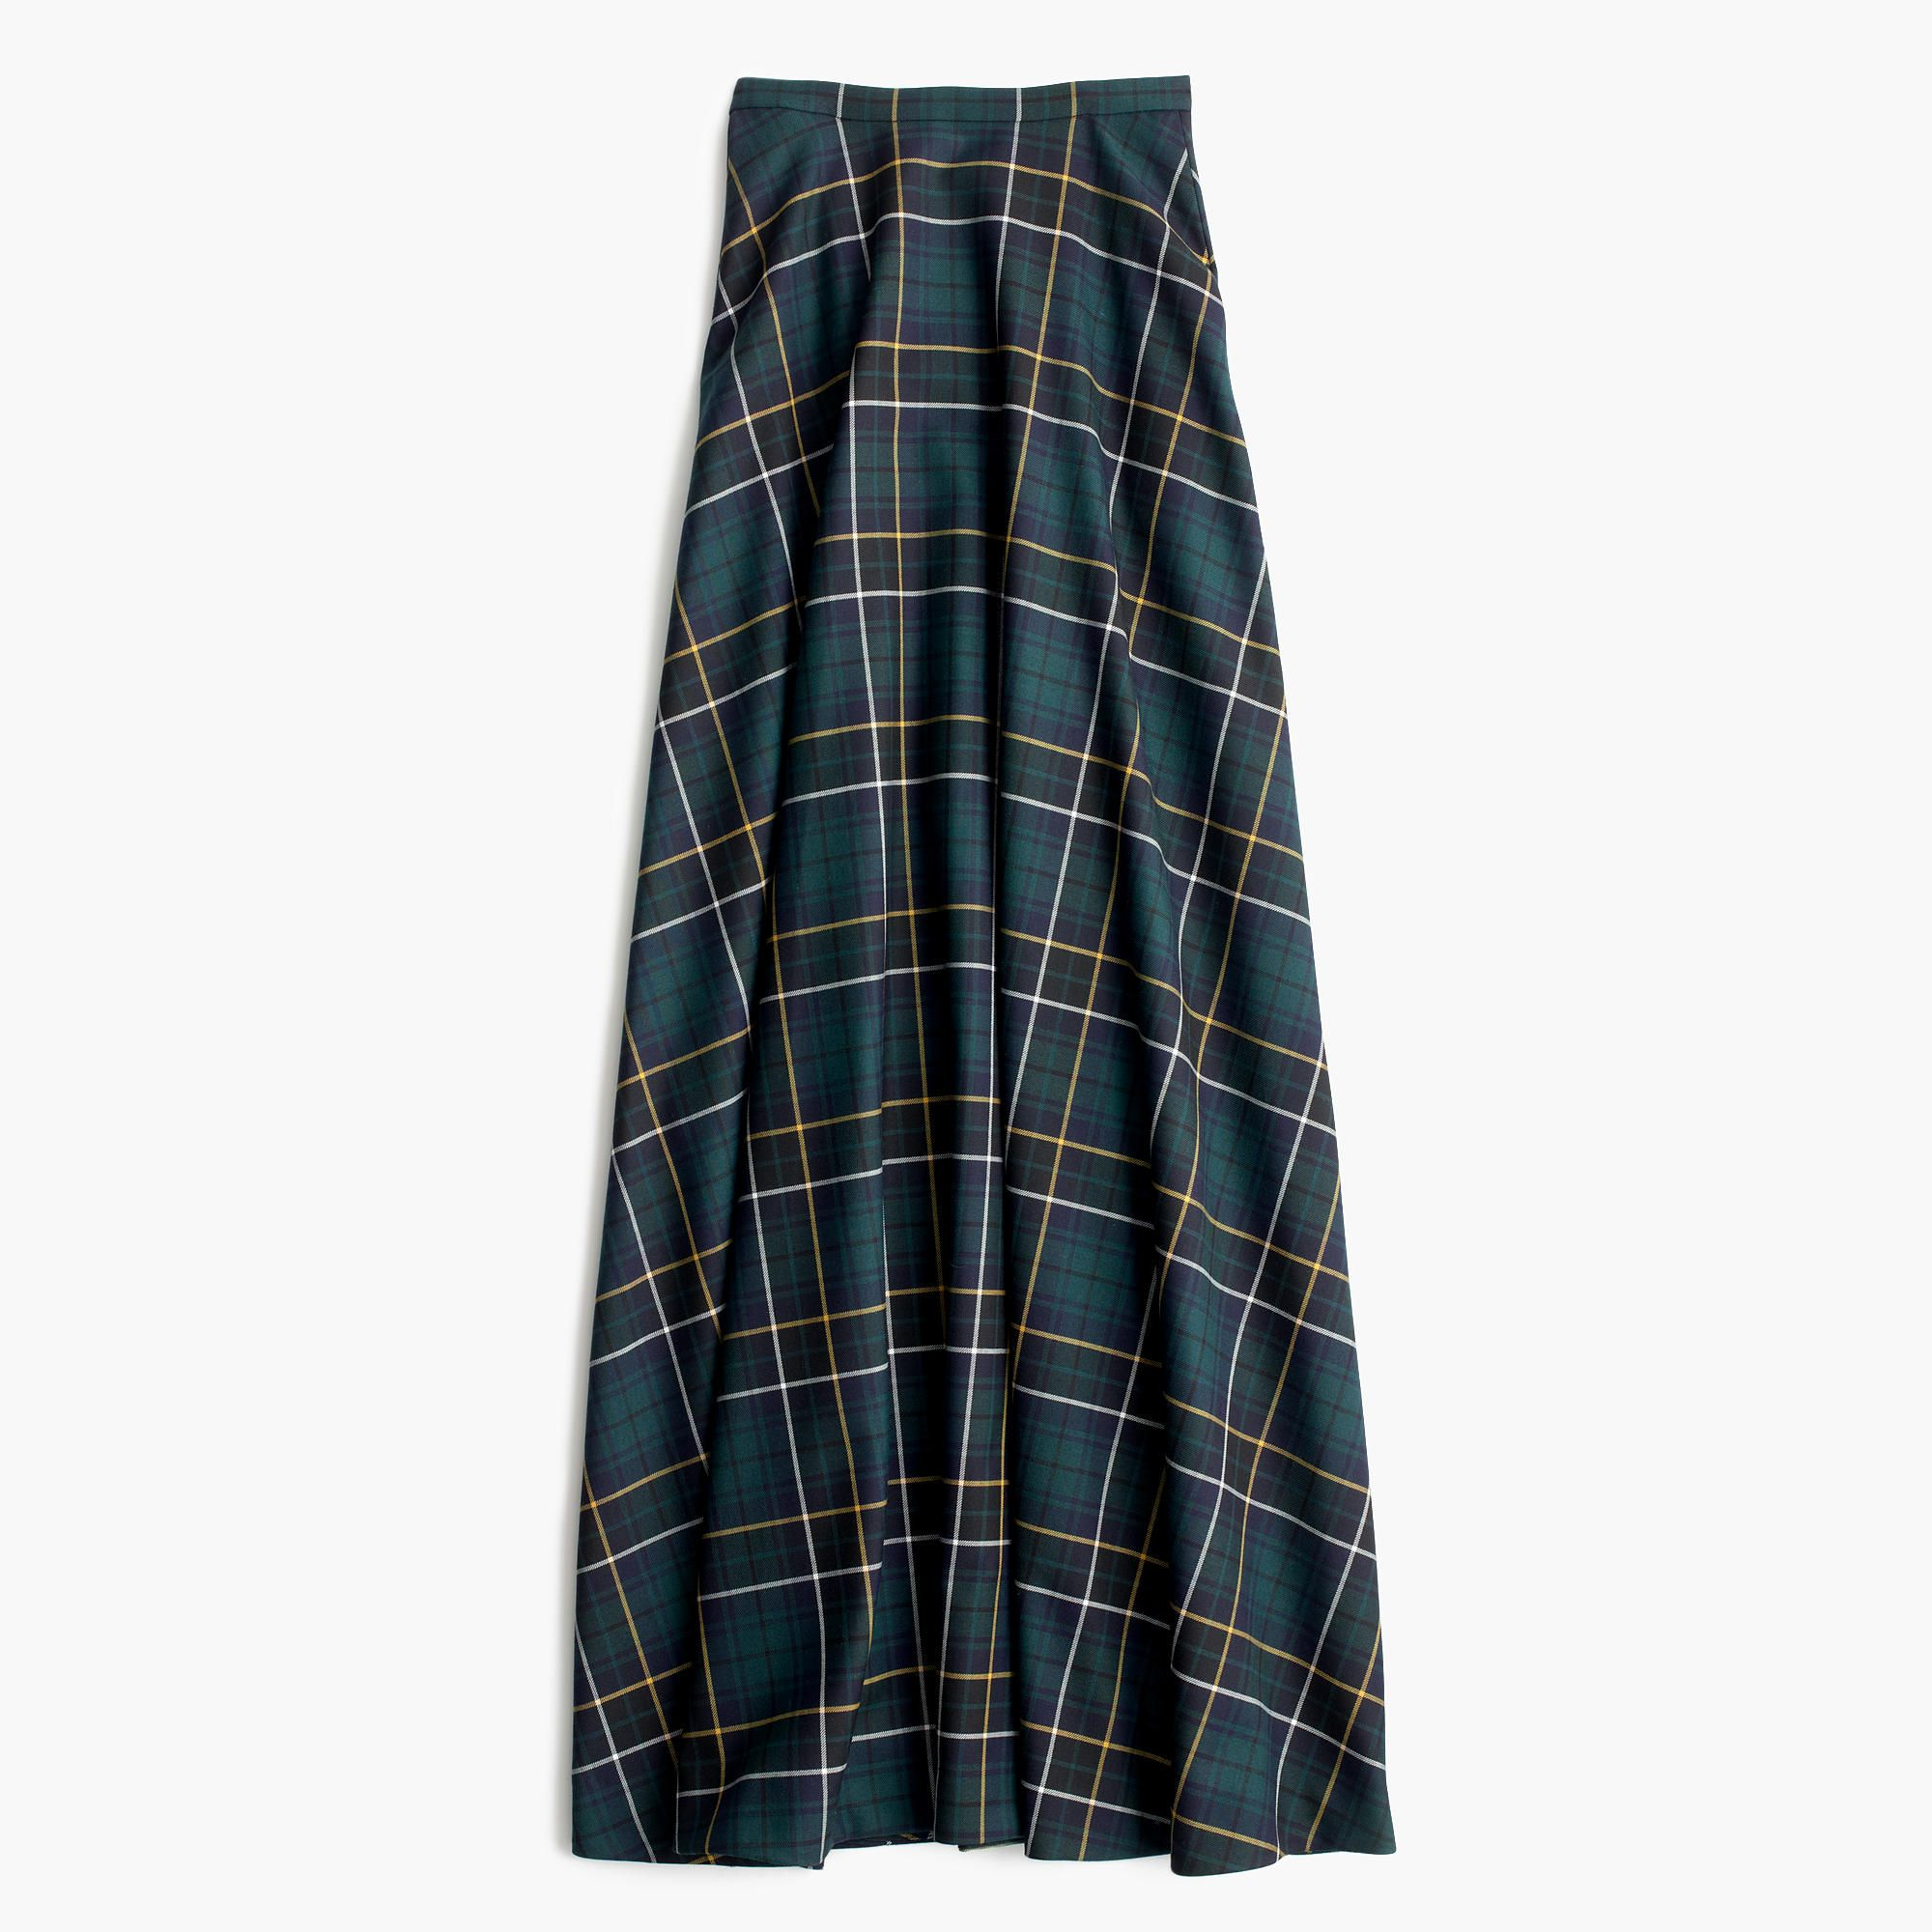 J.Crew - Collection maxi skirt in tartan